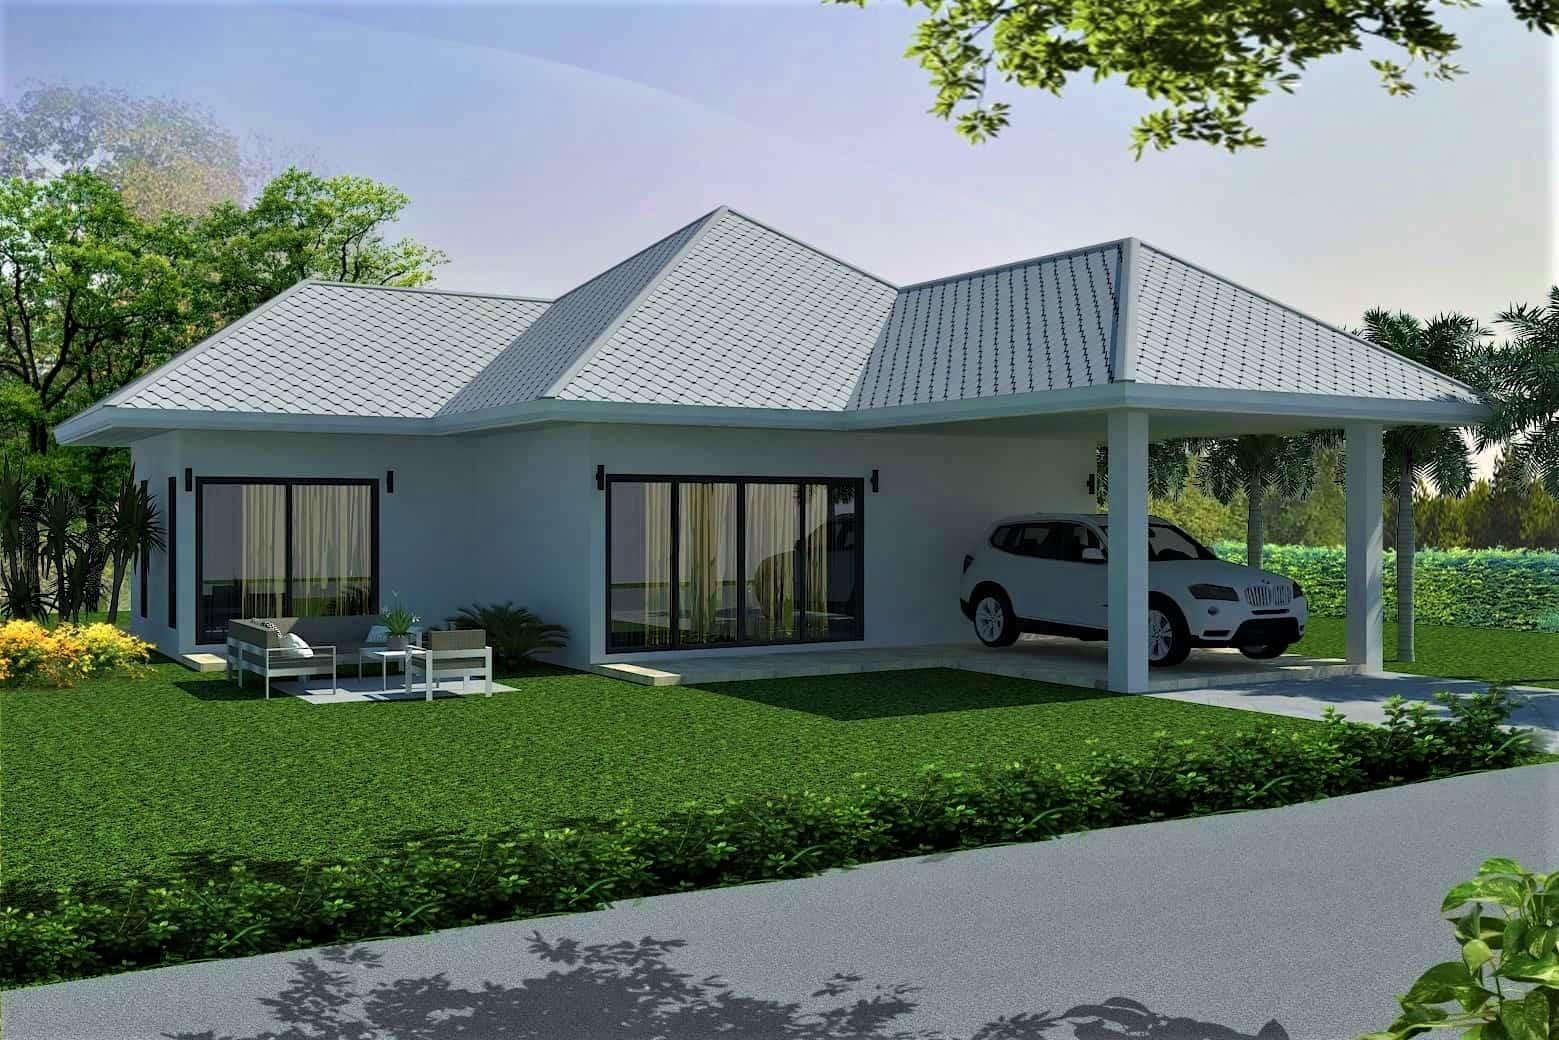 New Villas in Hua Hin Development with Mountain View